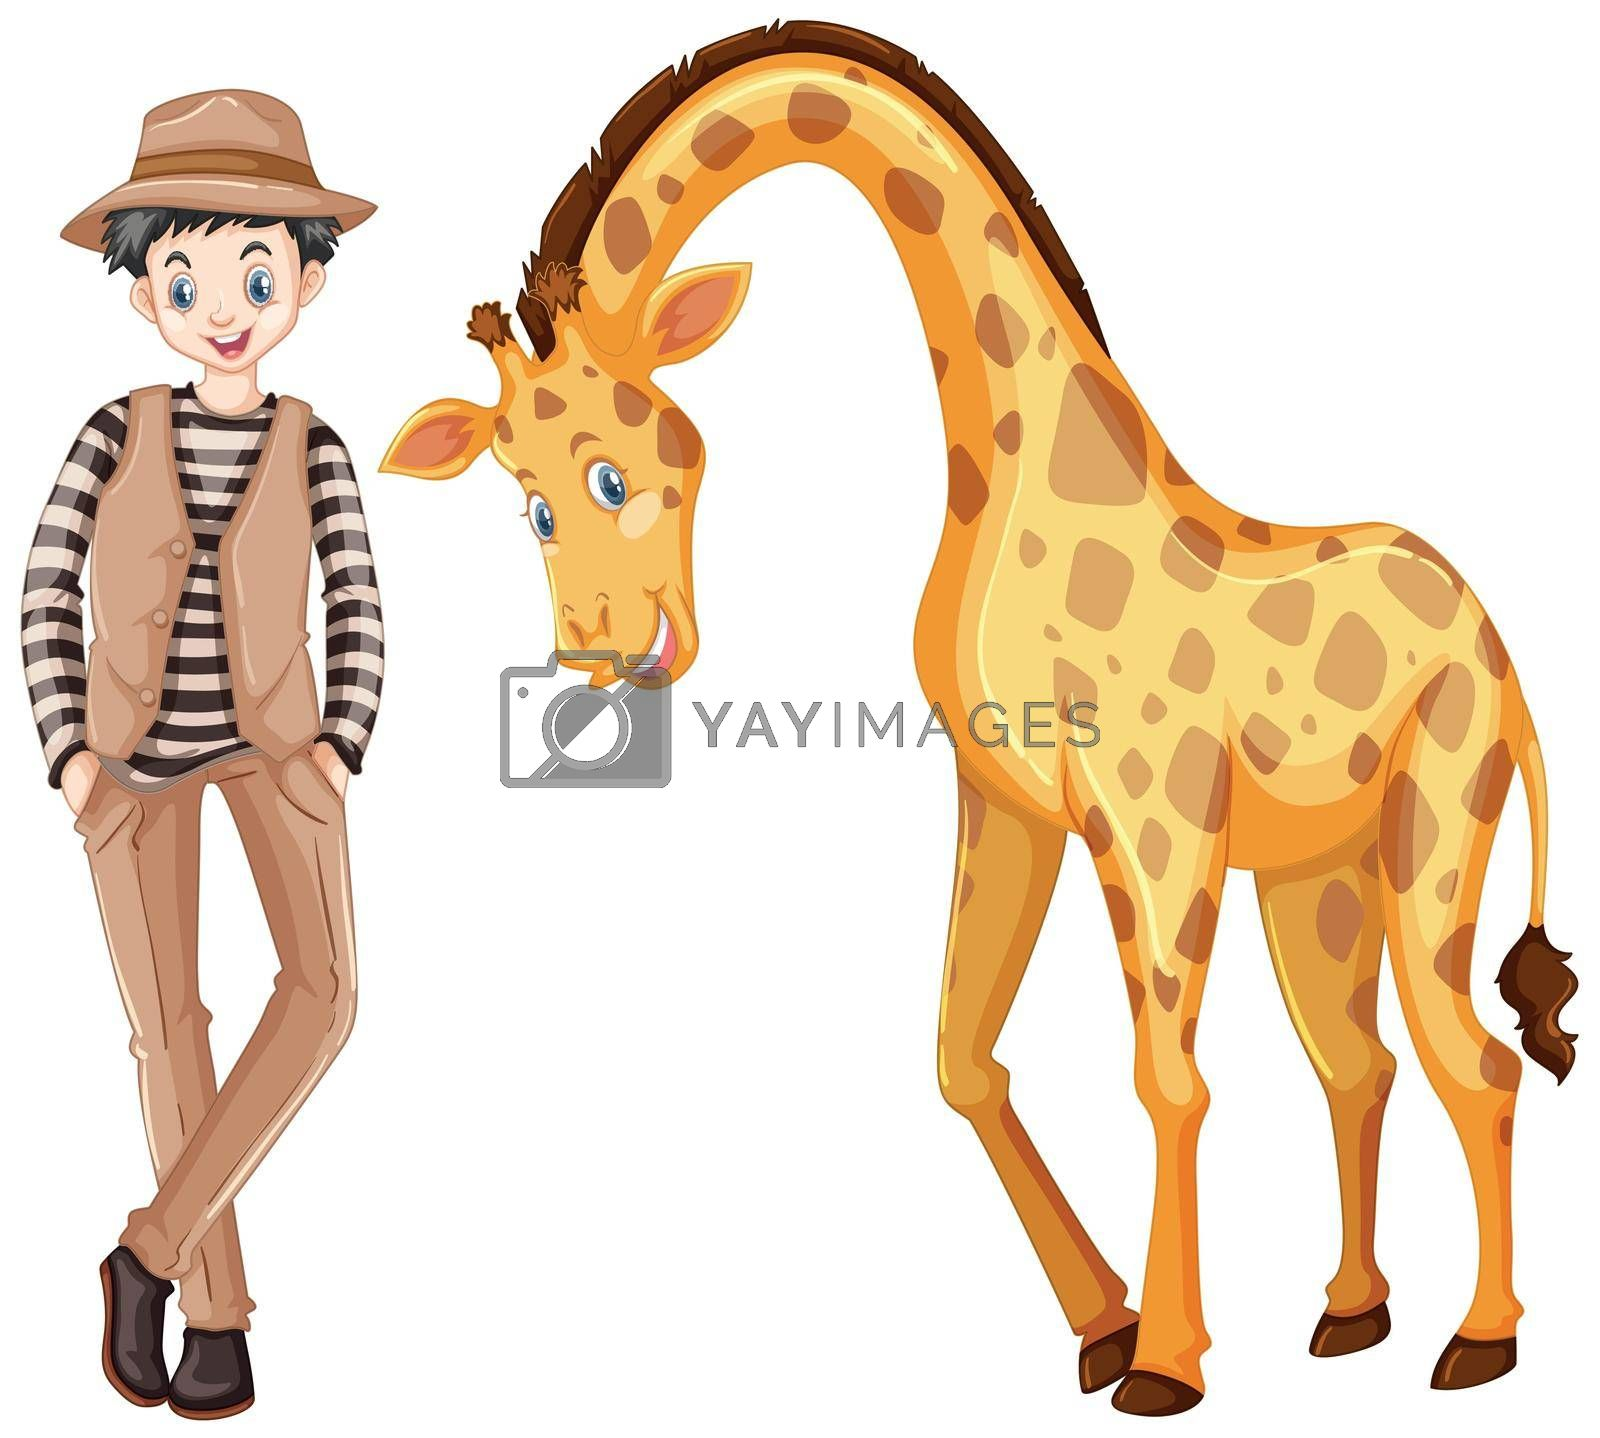 Tall man and cute giraffe illustration